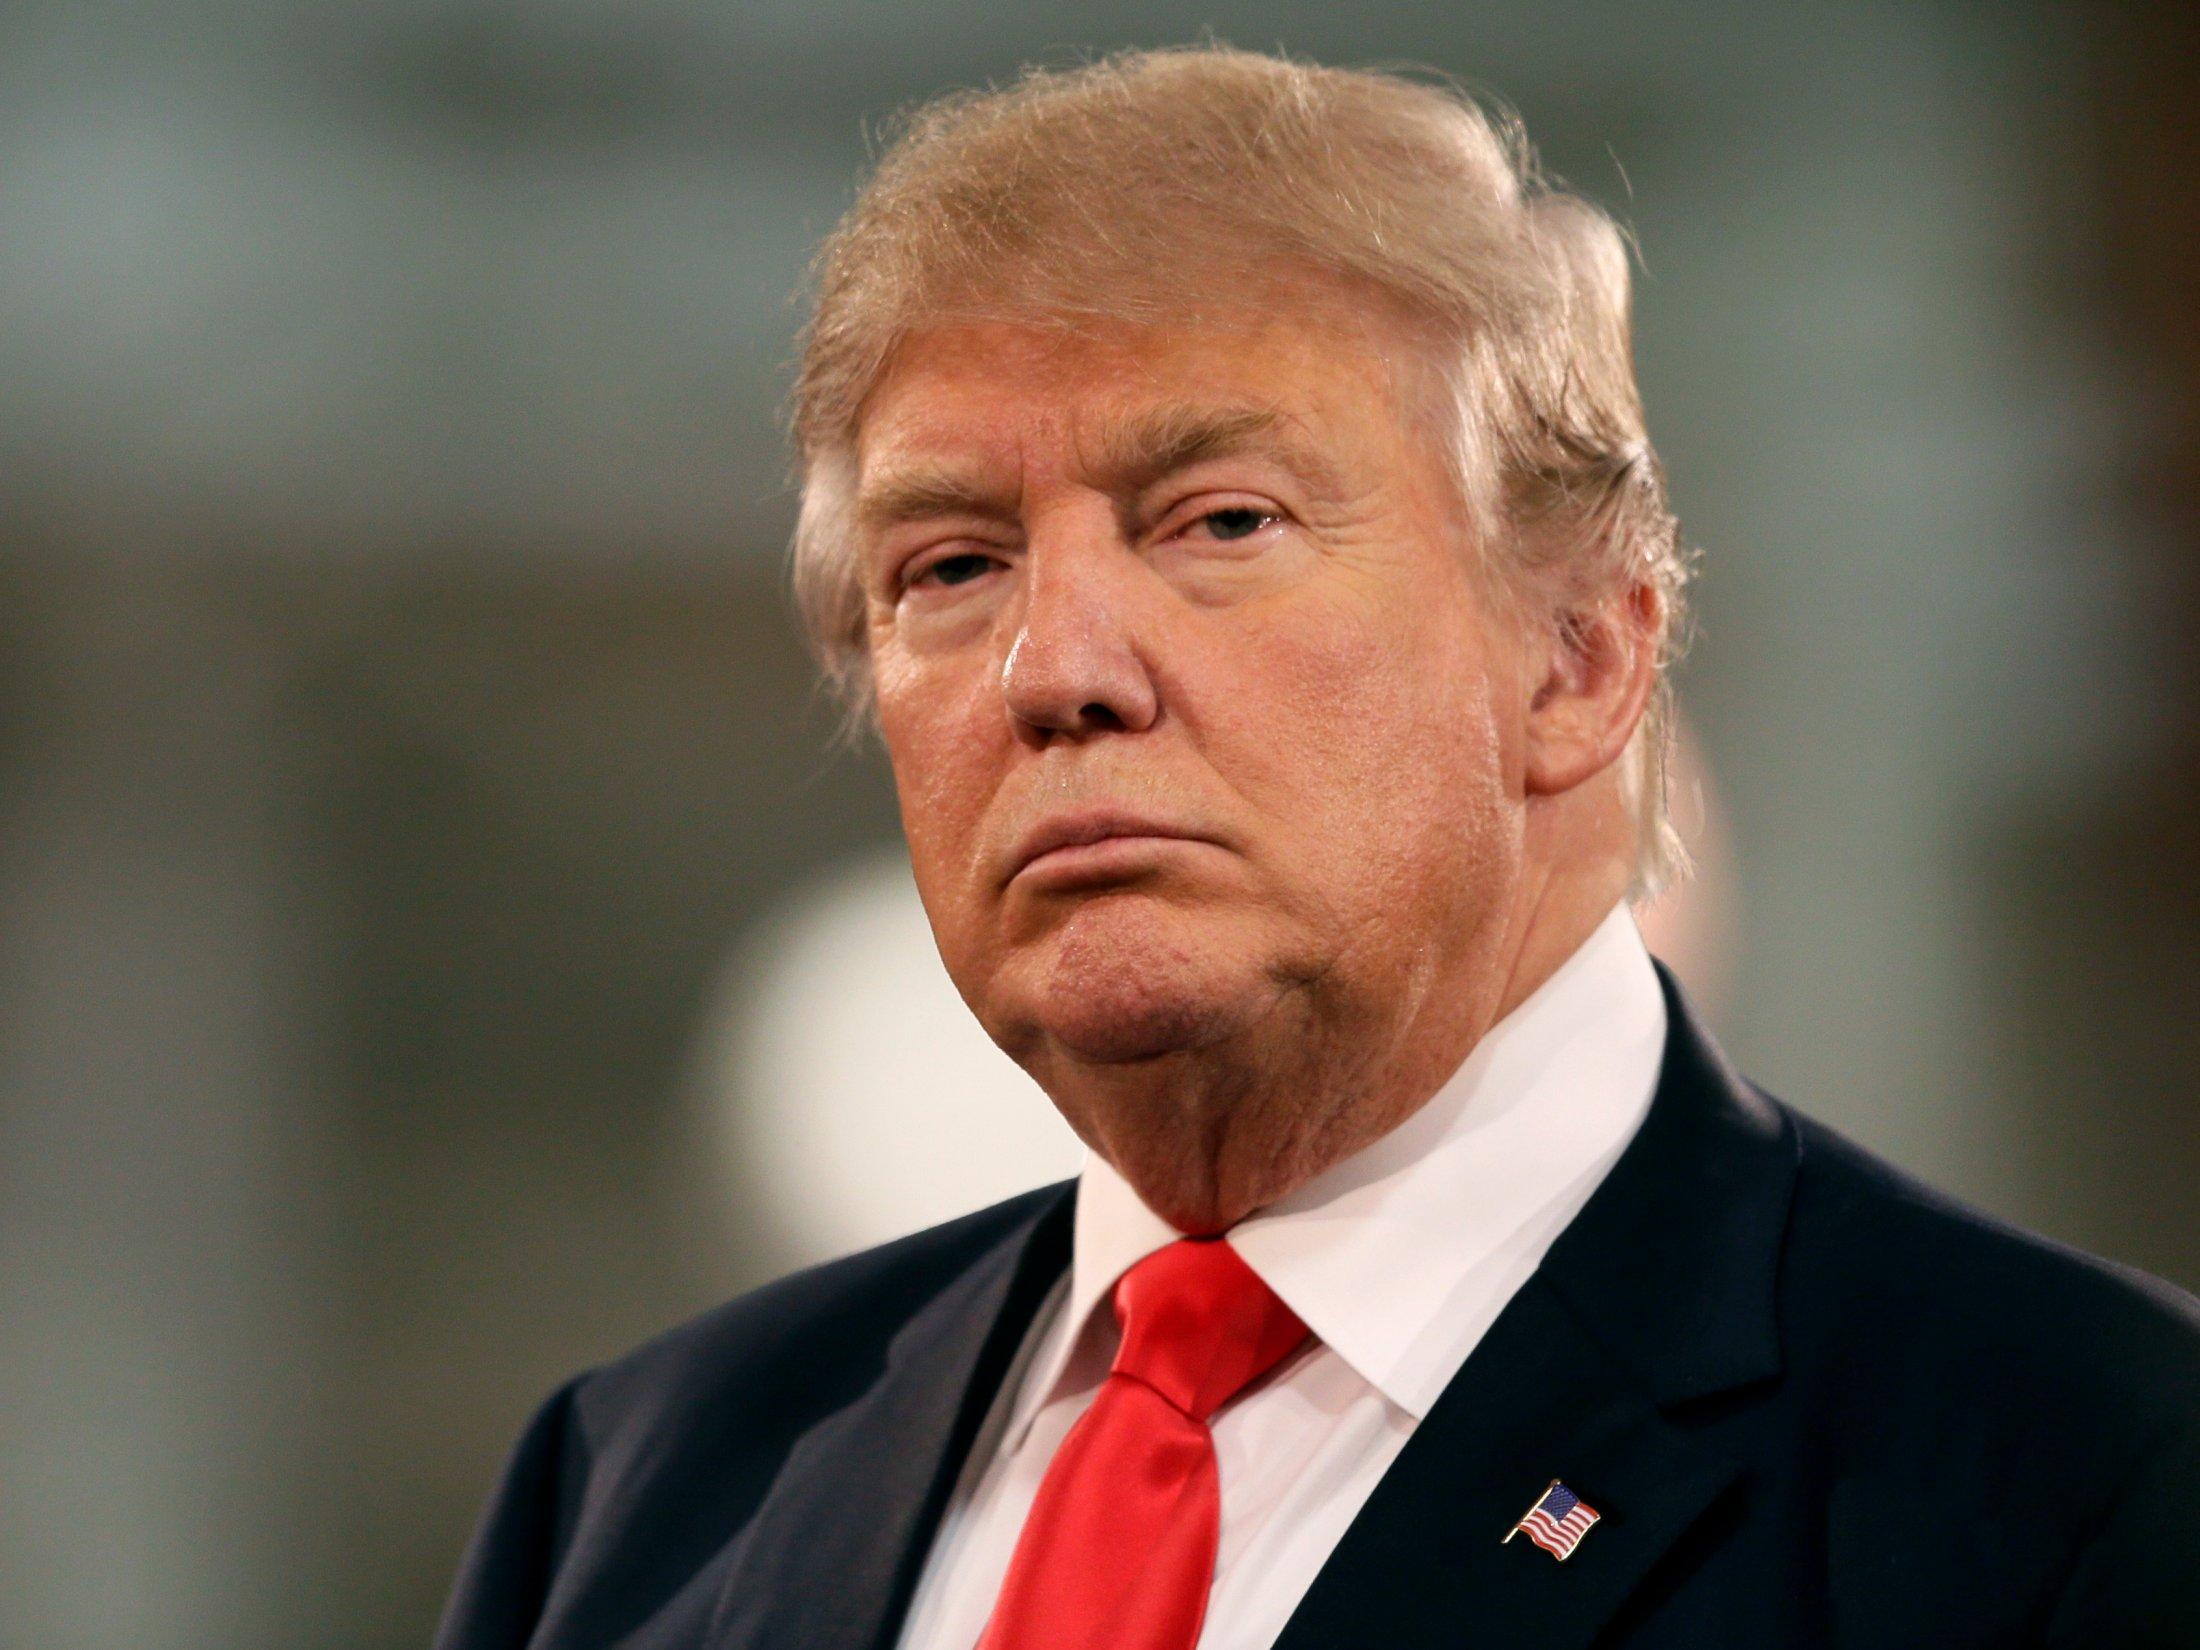 Grump Trump